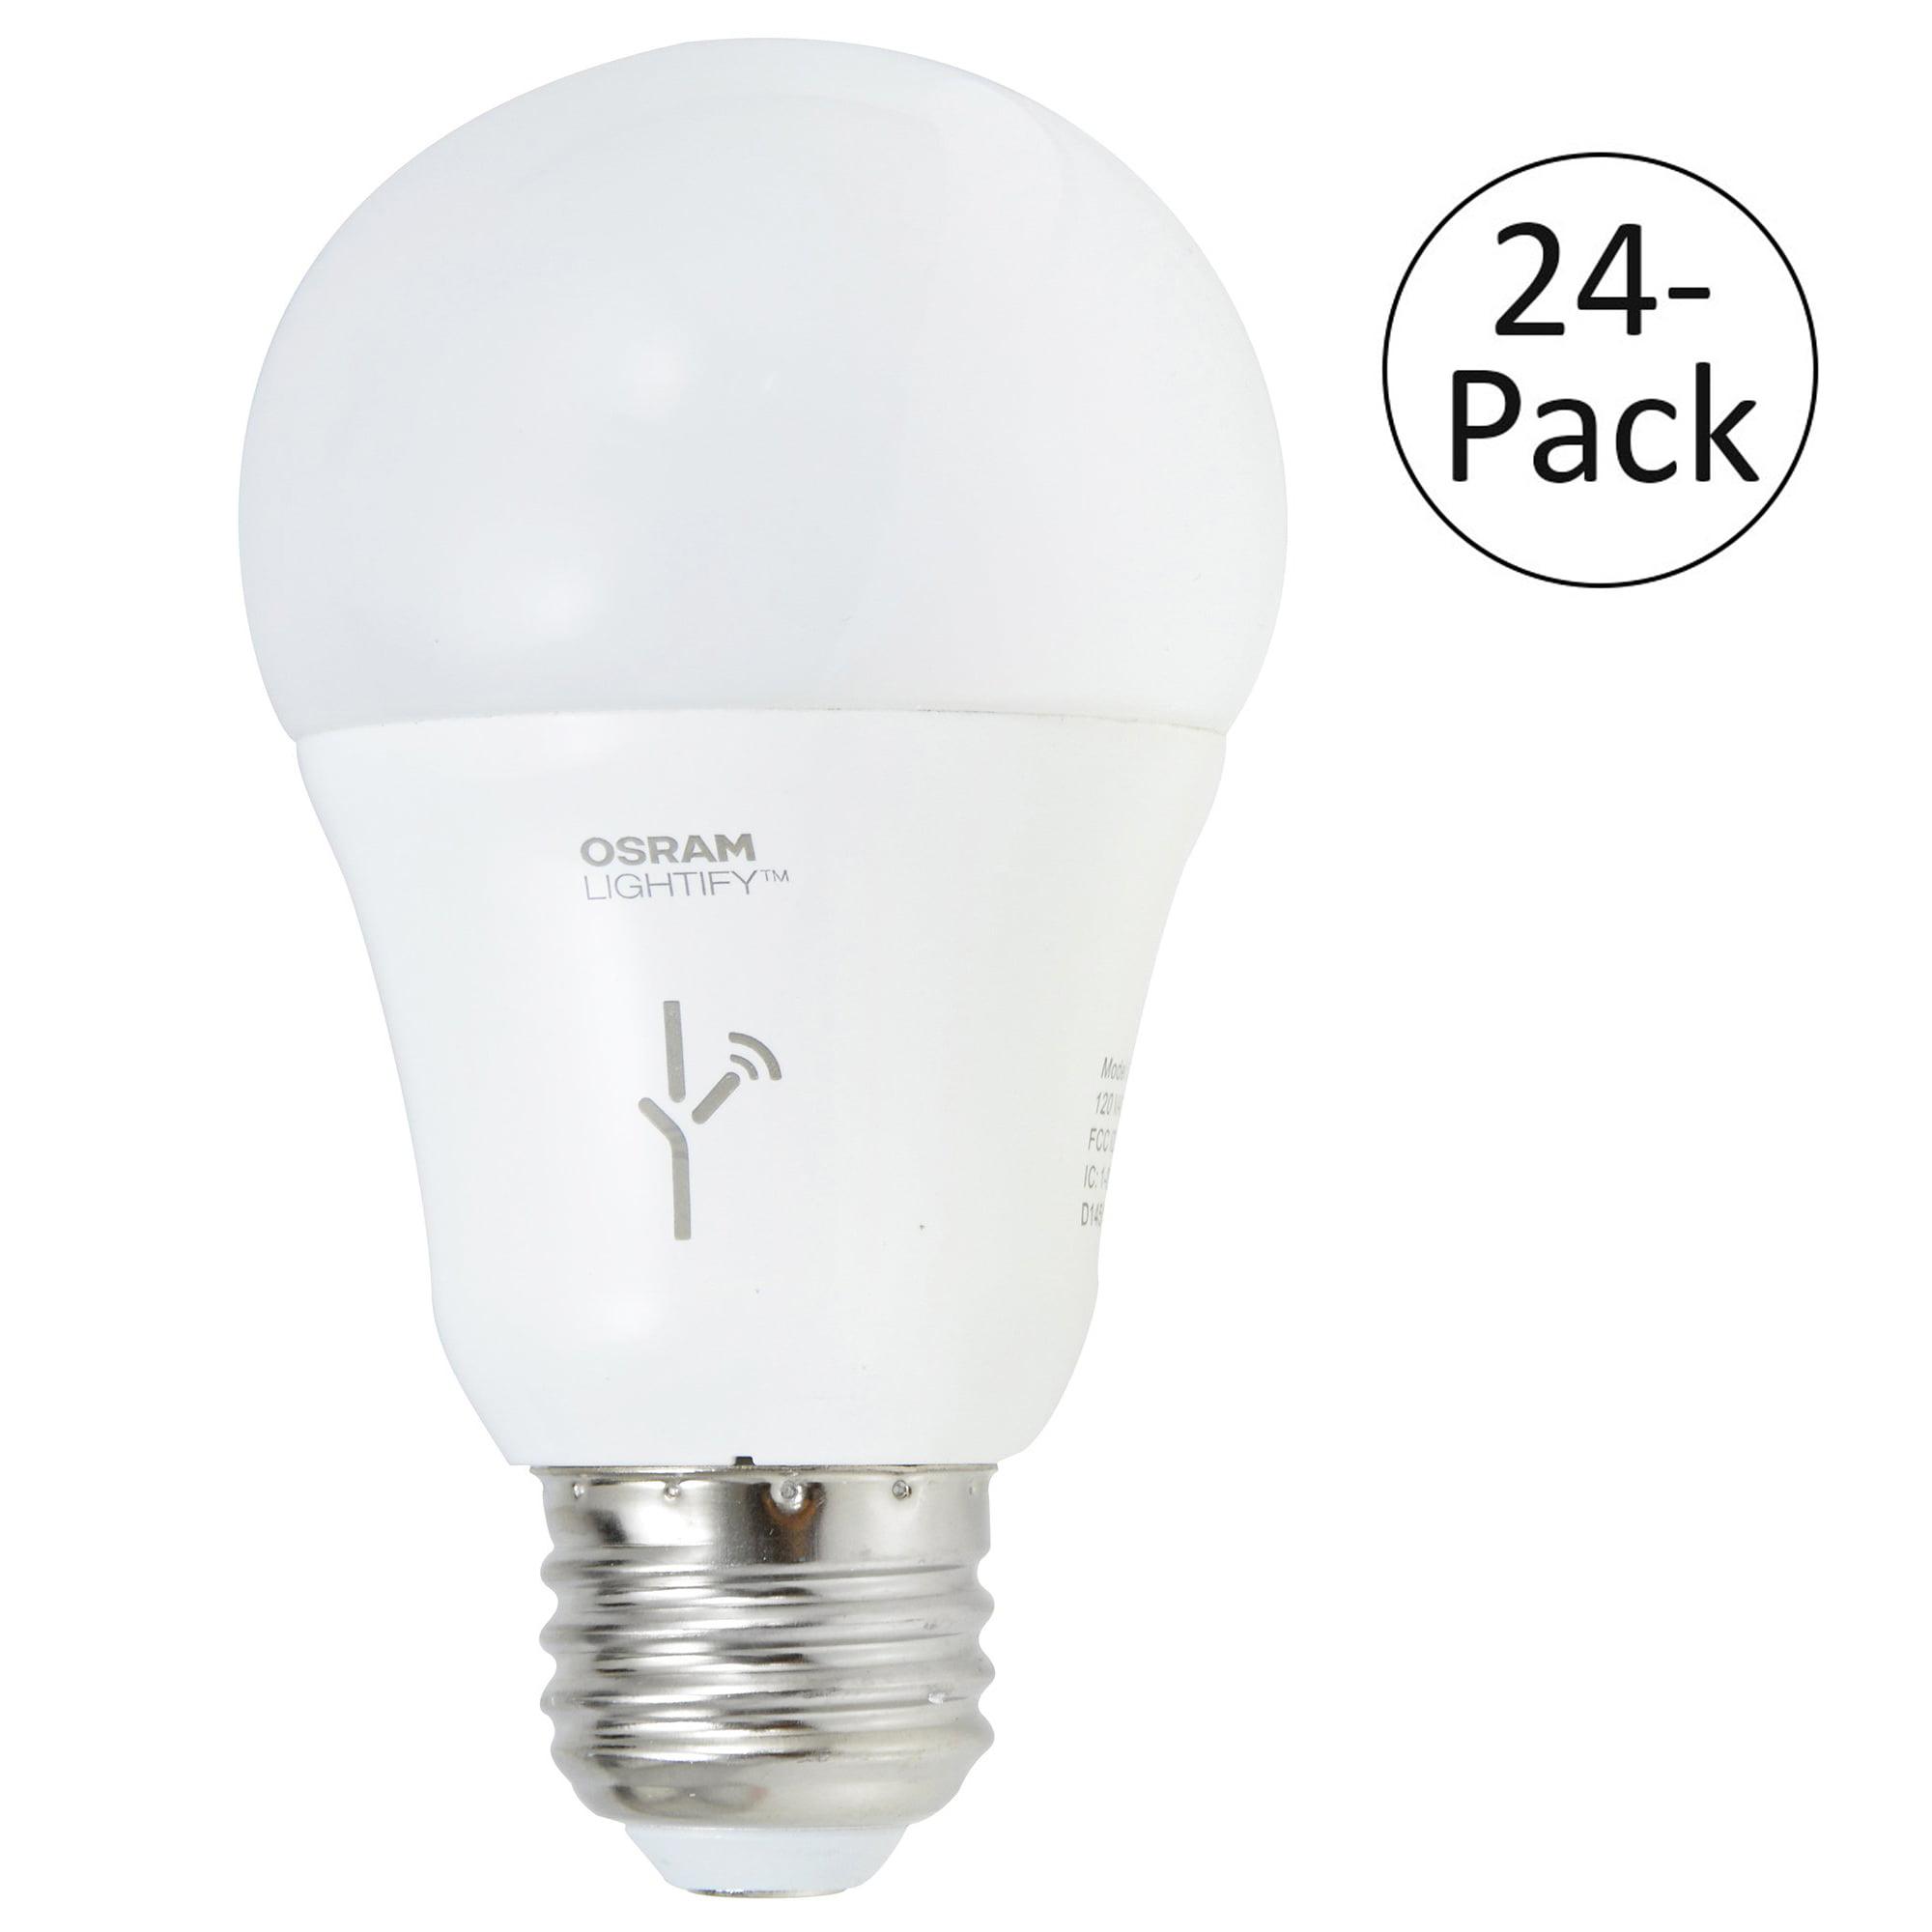 Sylvania Lightify 60-Watt A19 Tunable White Smart Home LE...